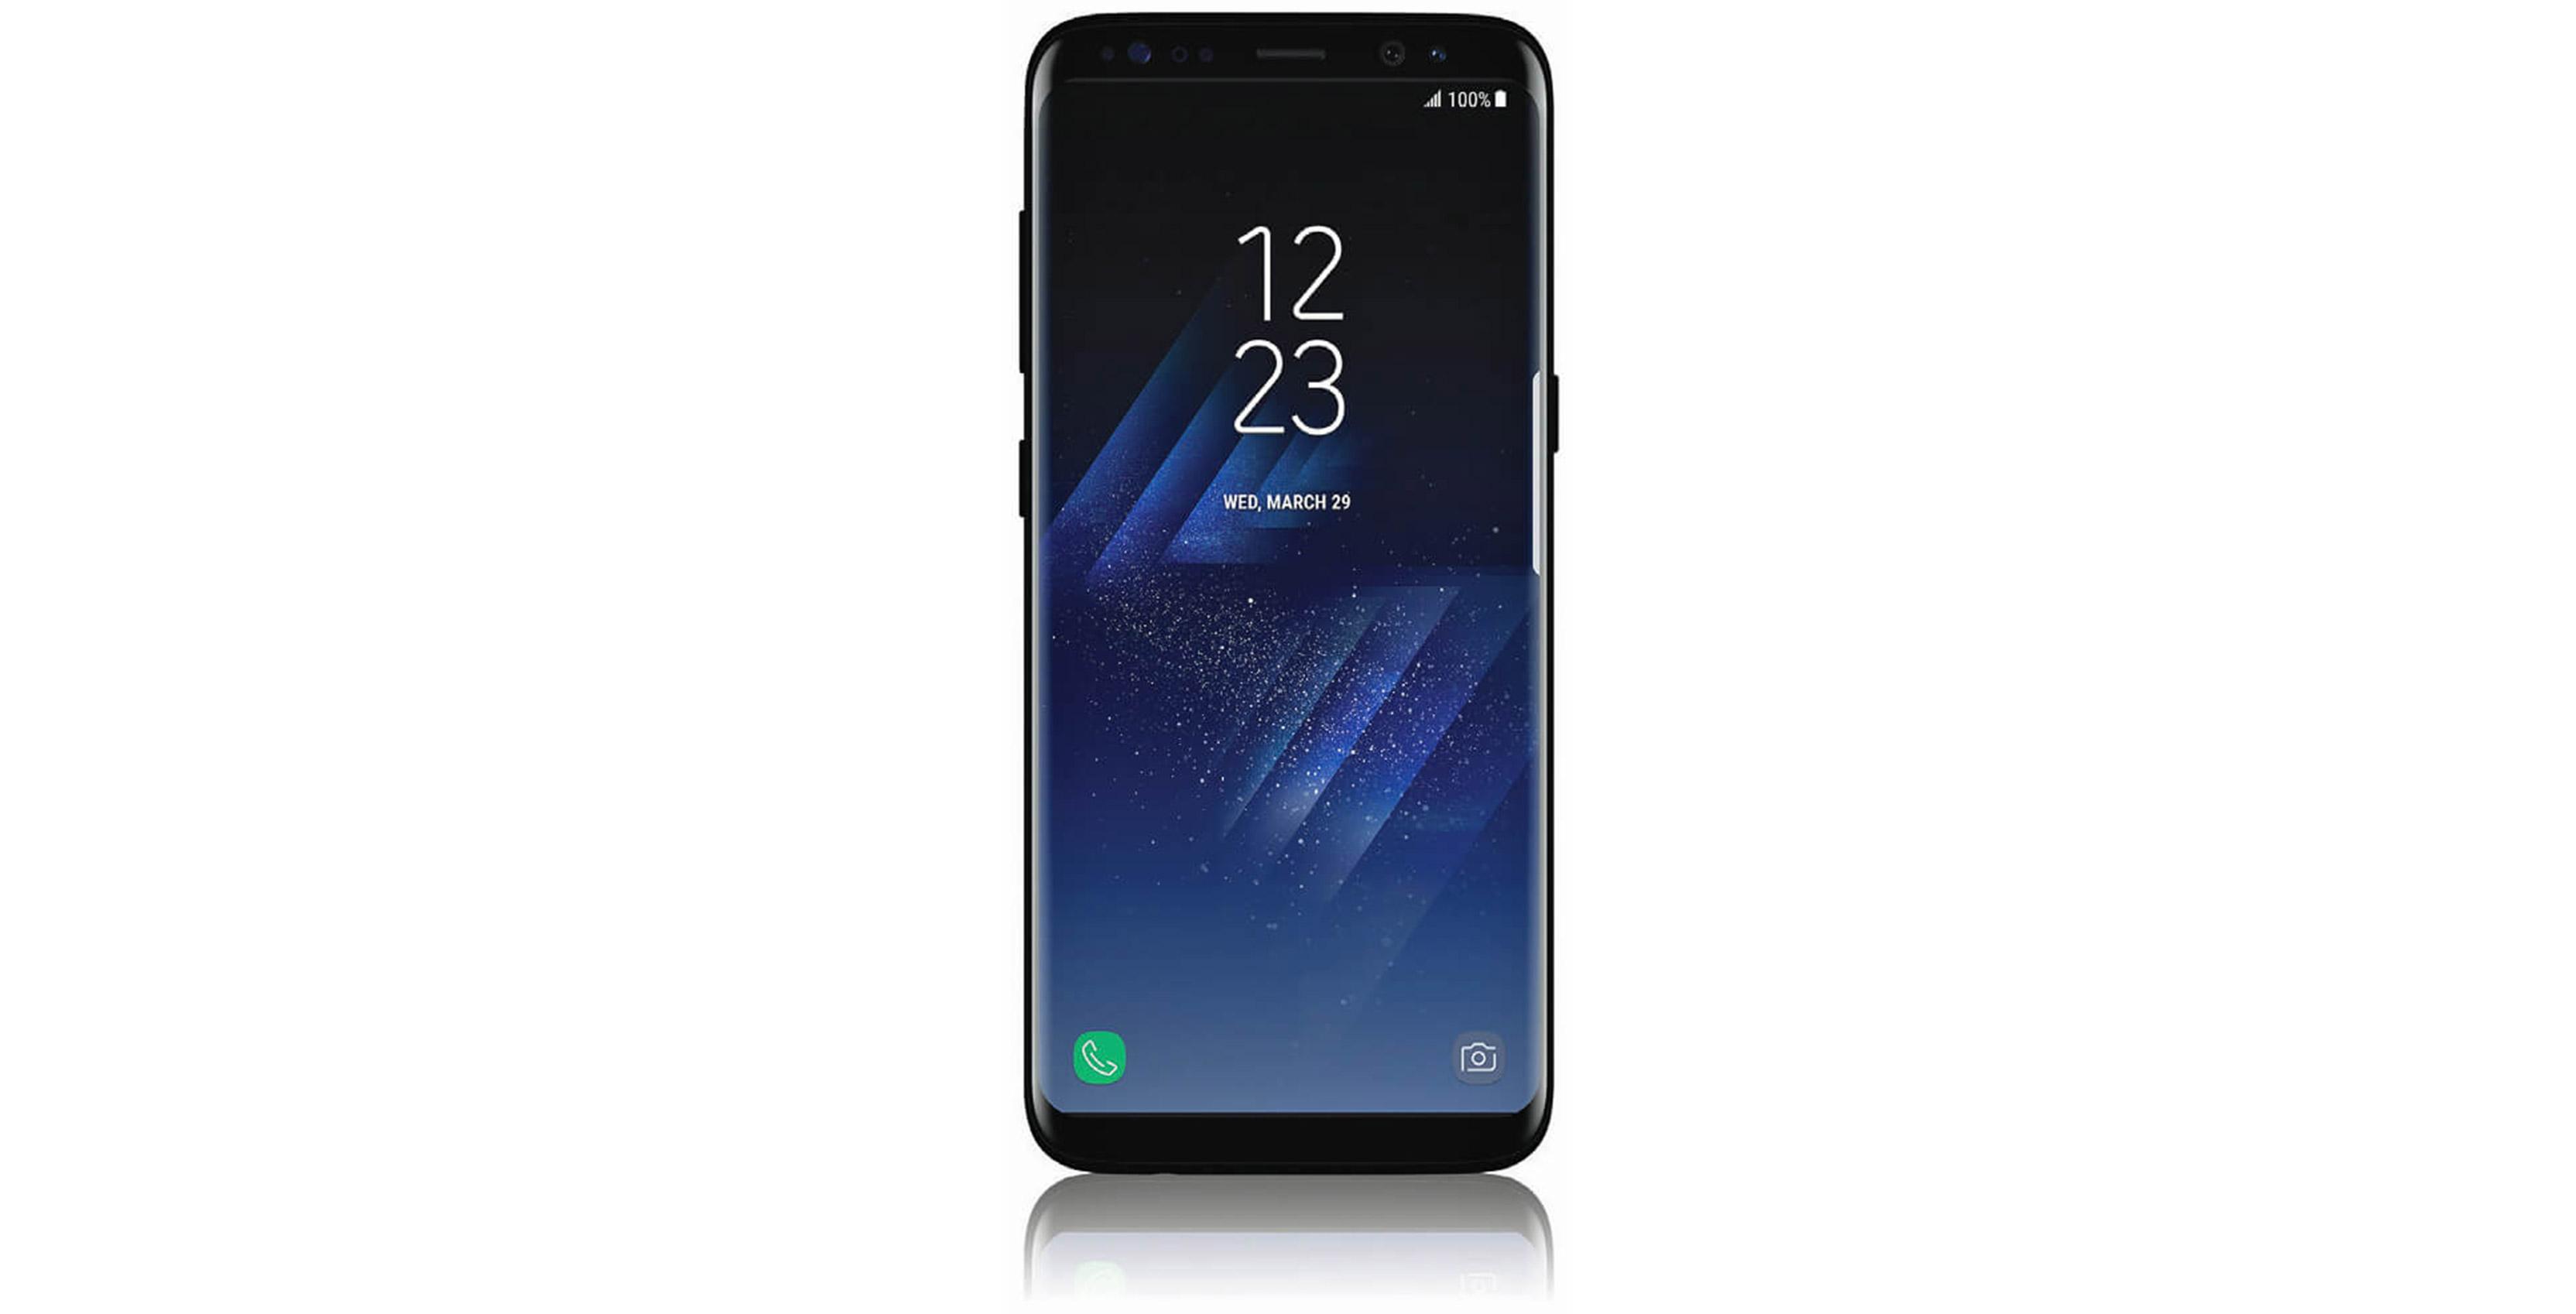 Galaxy S8 UI Samsung Experience